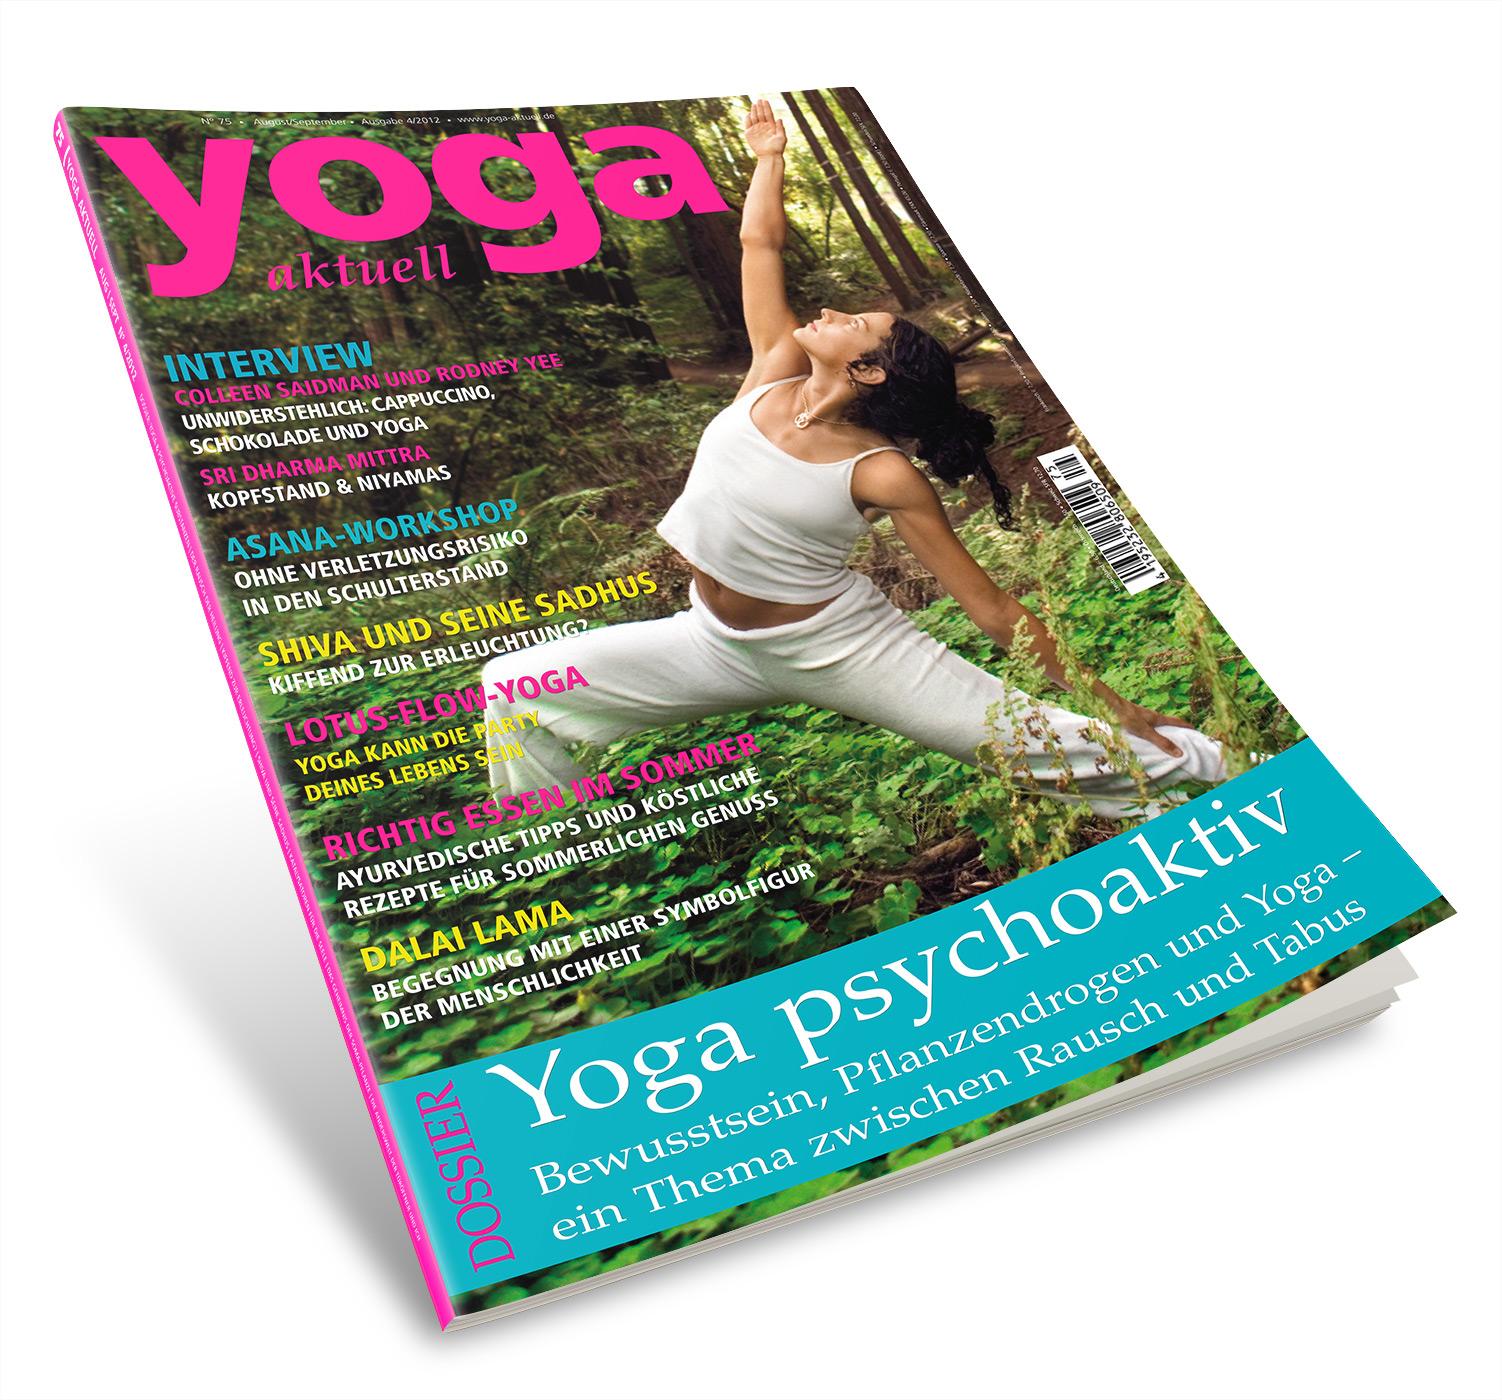 Yoga Aktuell 75 - 04/2012